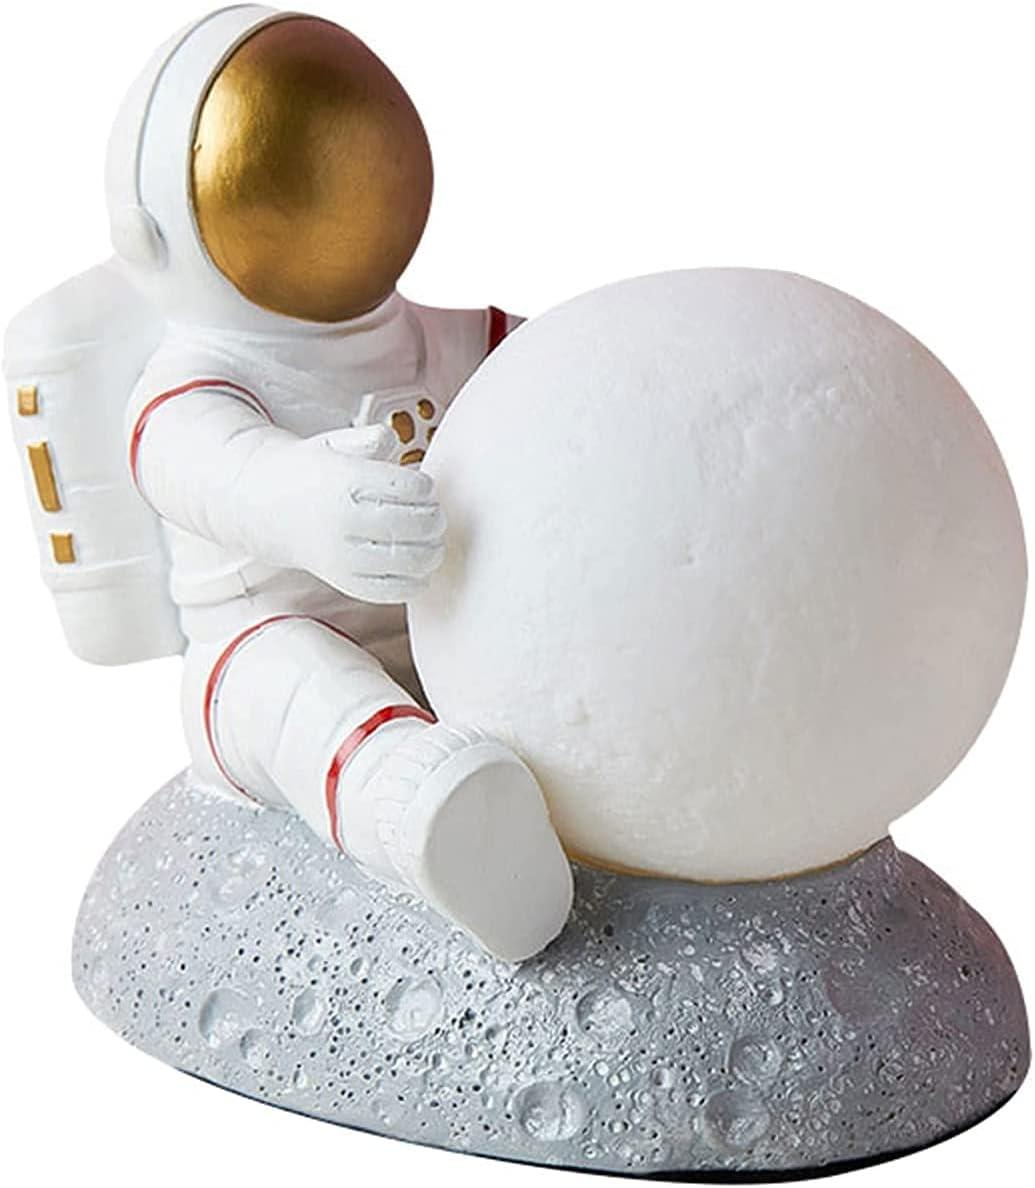 G-teeth Astronaut Moon Lamp Figurine New product Table Themed Ornamen Space High quality